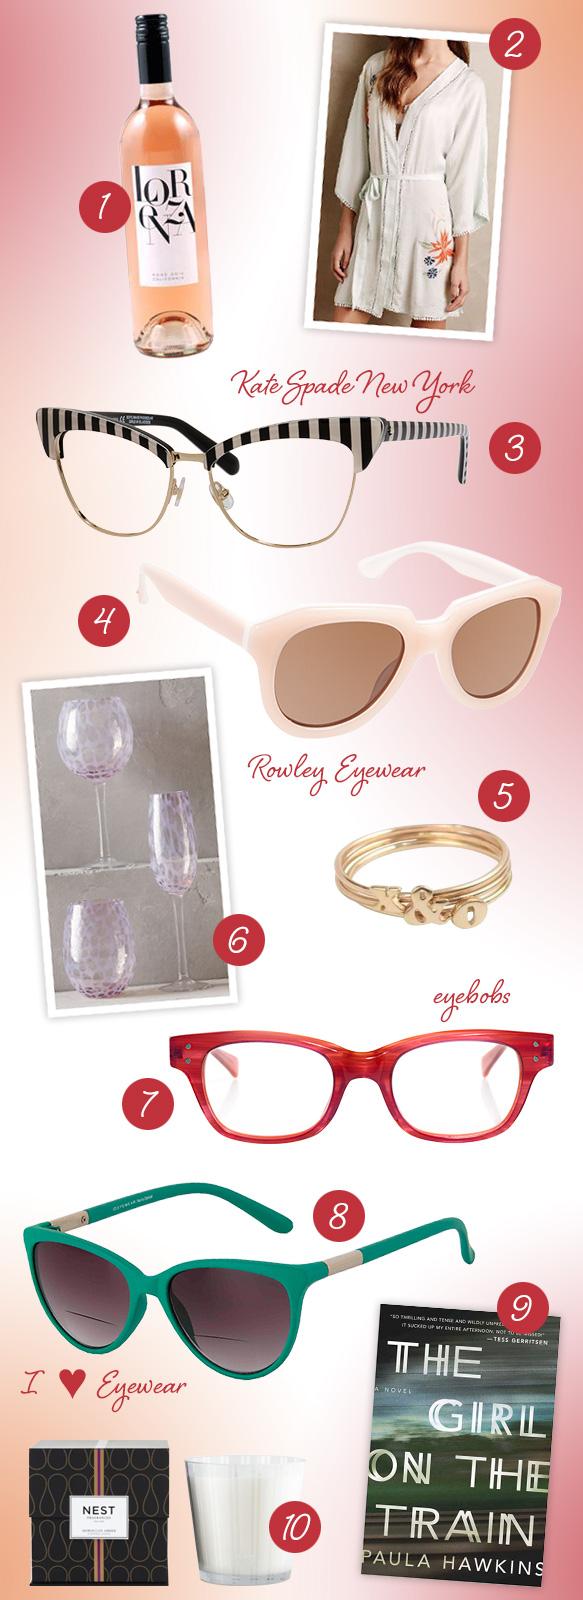 Kate Spade New York (Janna), Rowley Eyewear (No. 81), eyebobs (Fizz Ed), I Heart Eyewear (Natasha)